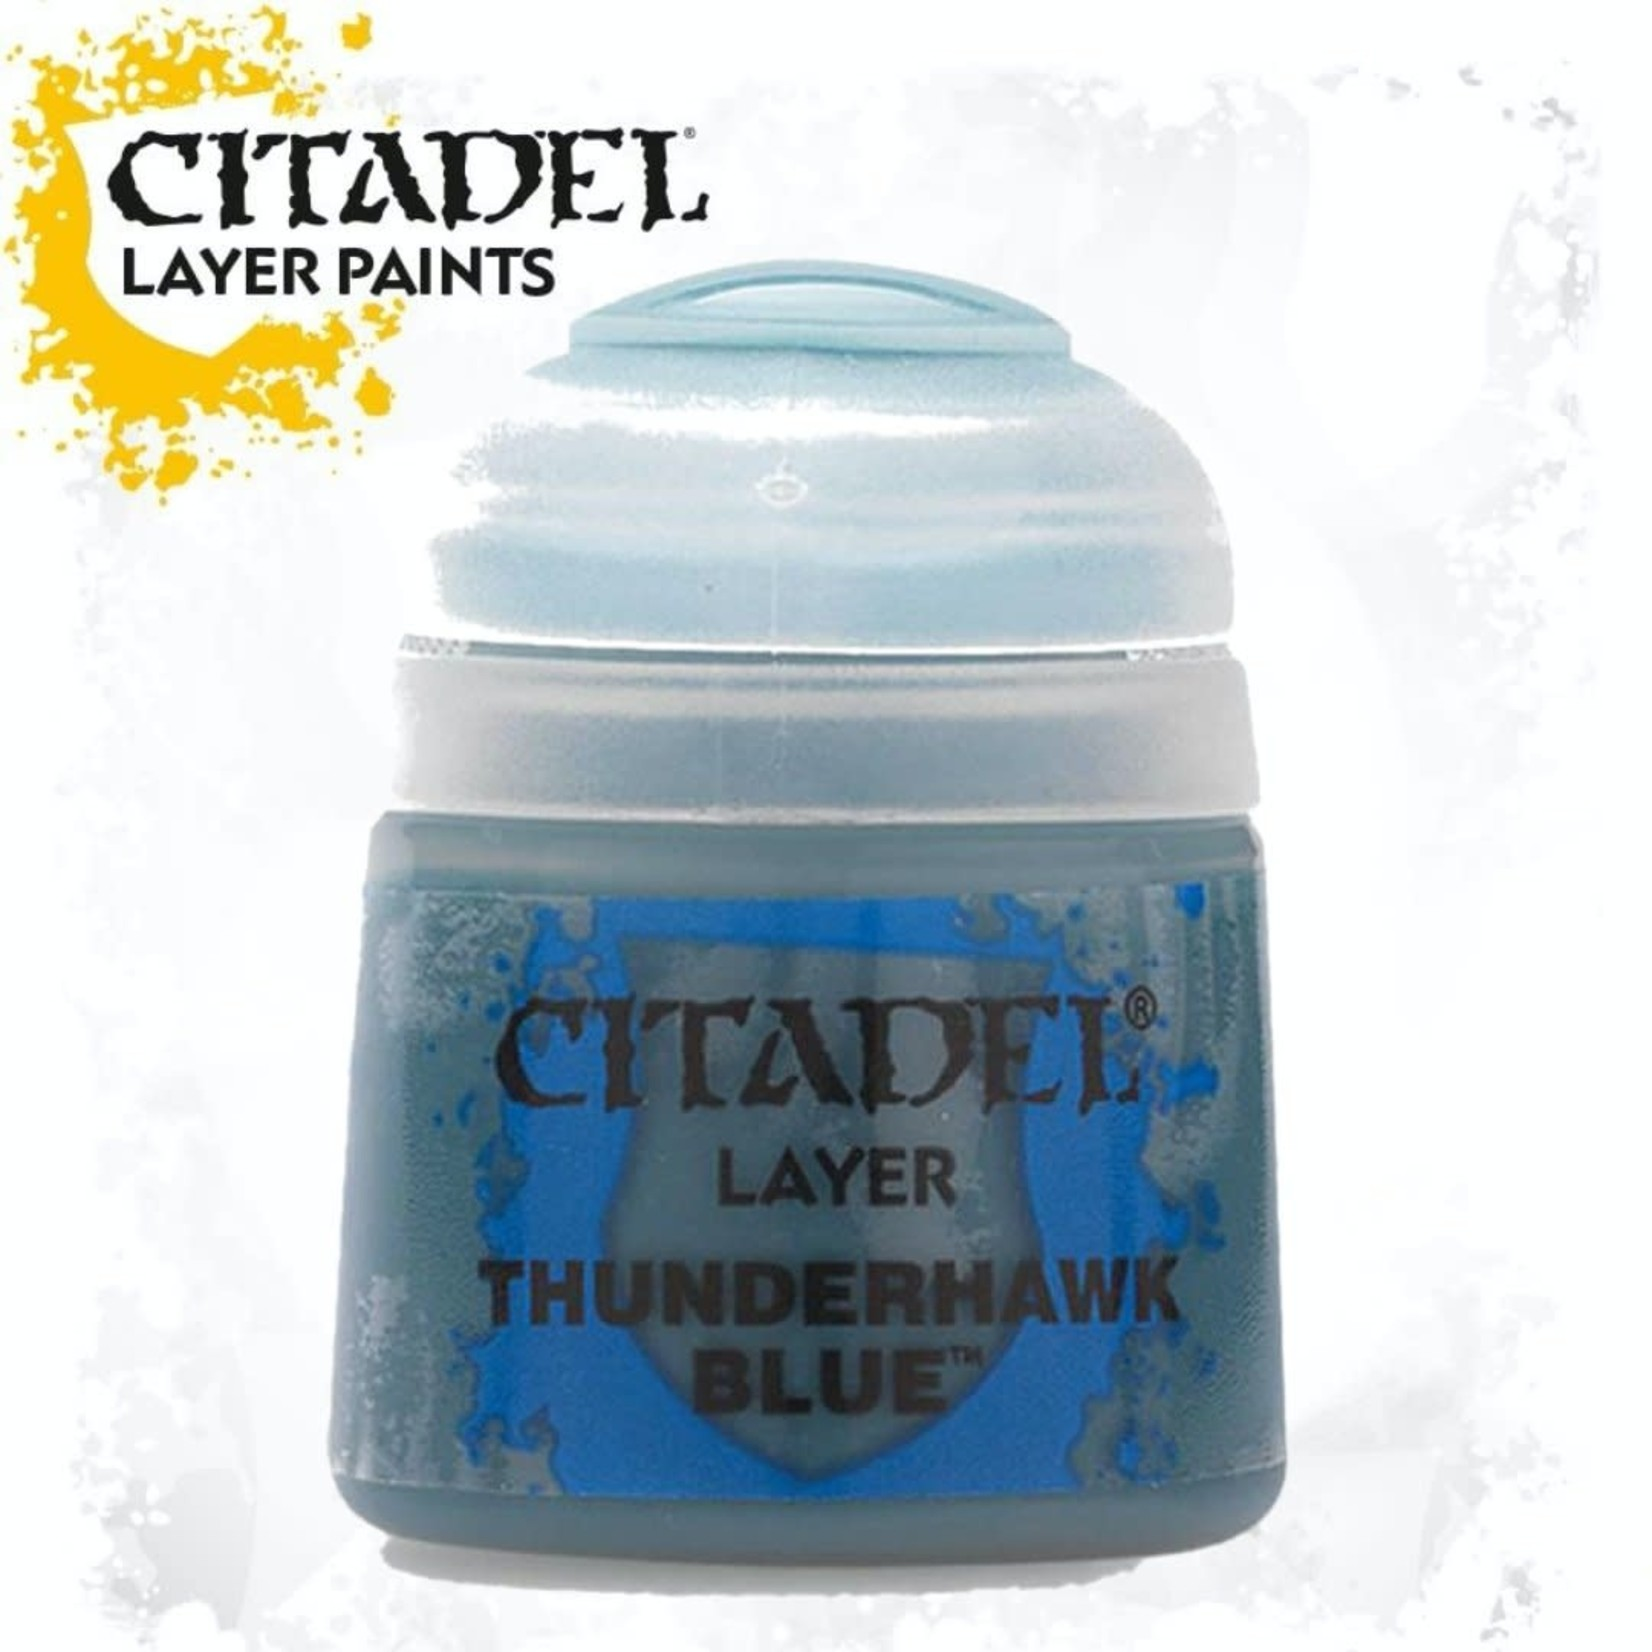 Citadel Citadel Paint - Layer: Thunderhawk Blue